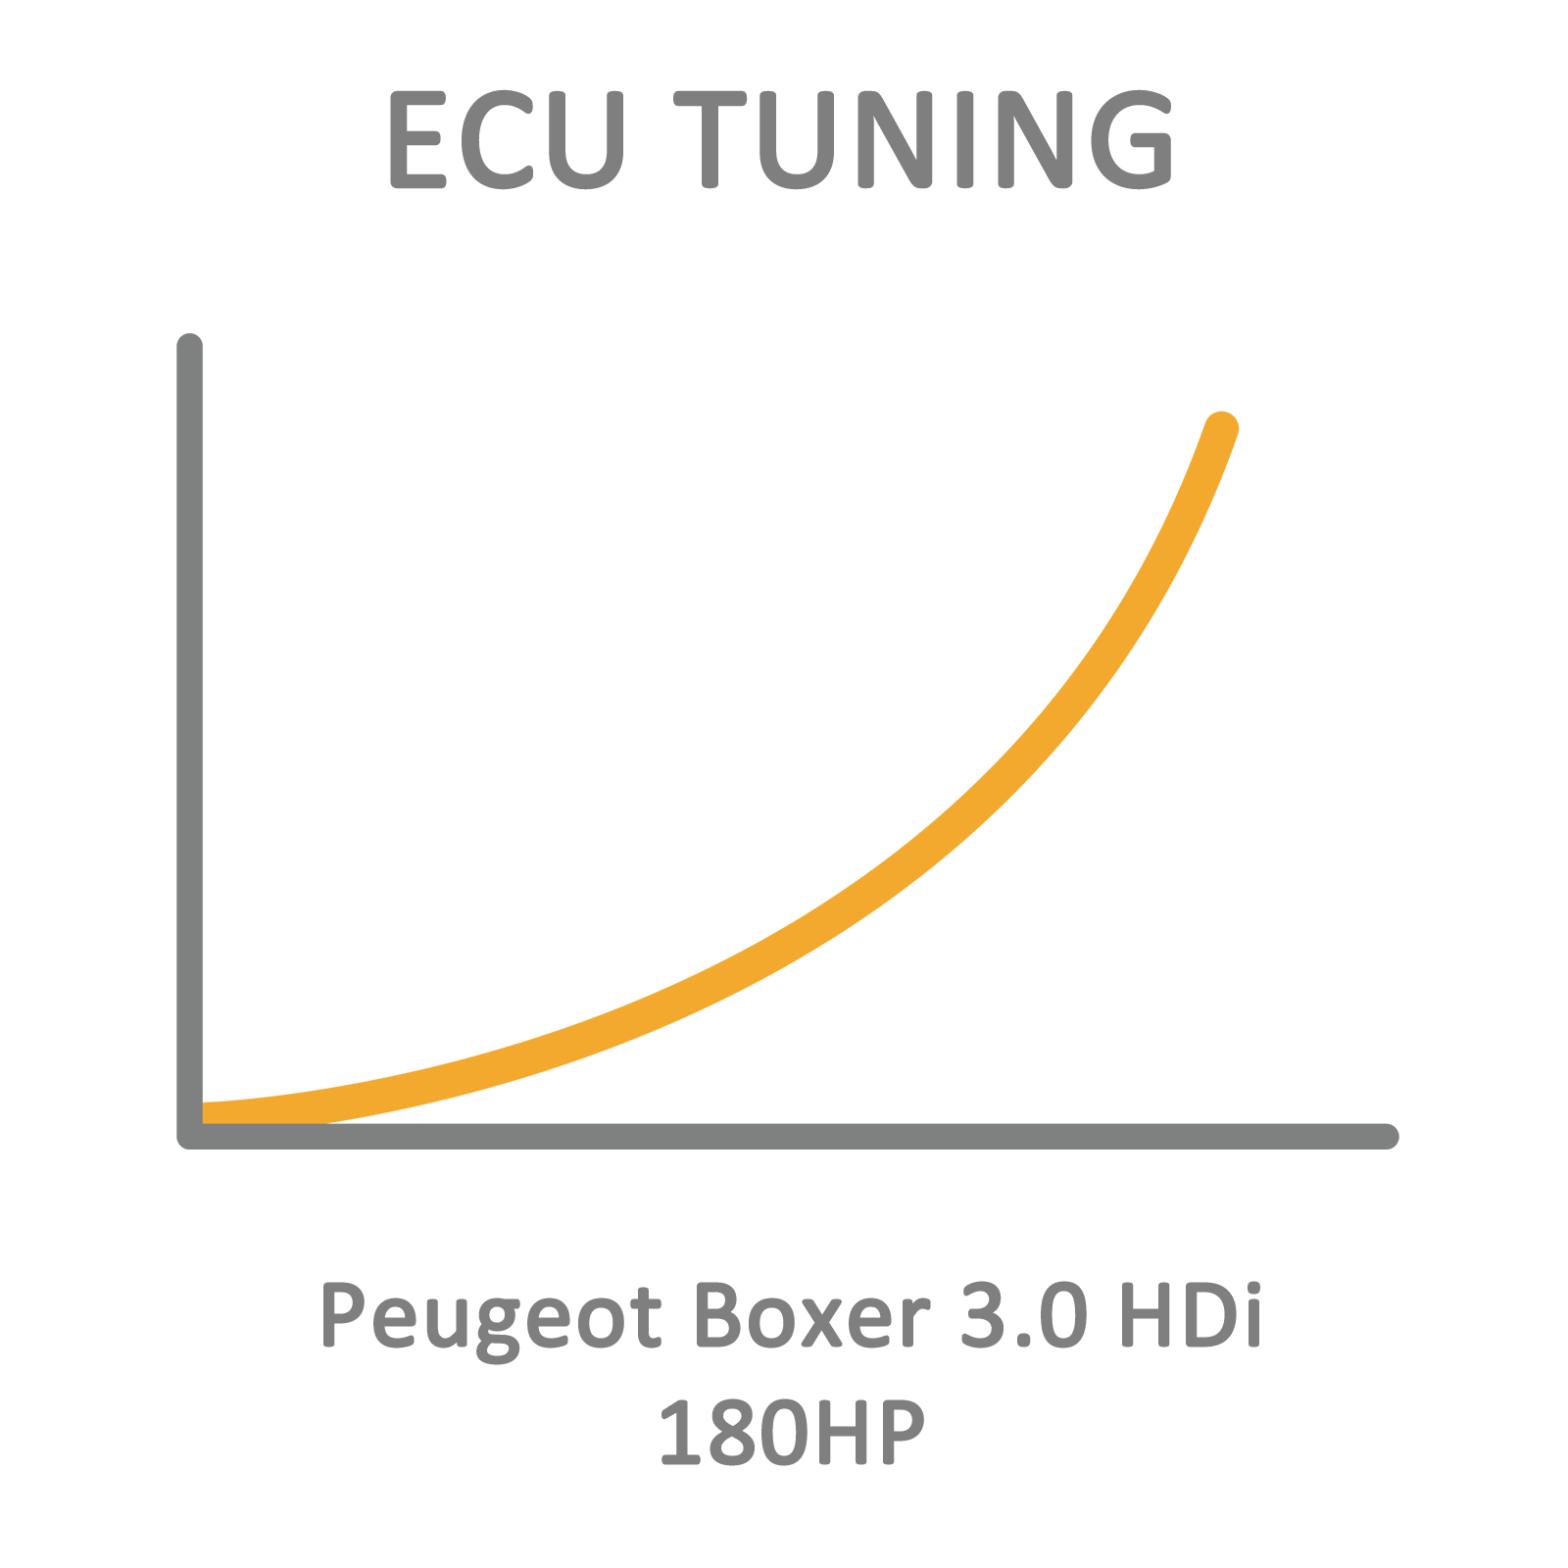 Peugeot Boxer 3.0 HDi 180HP ECU Tuning Remapping Programming